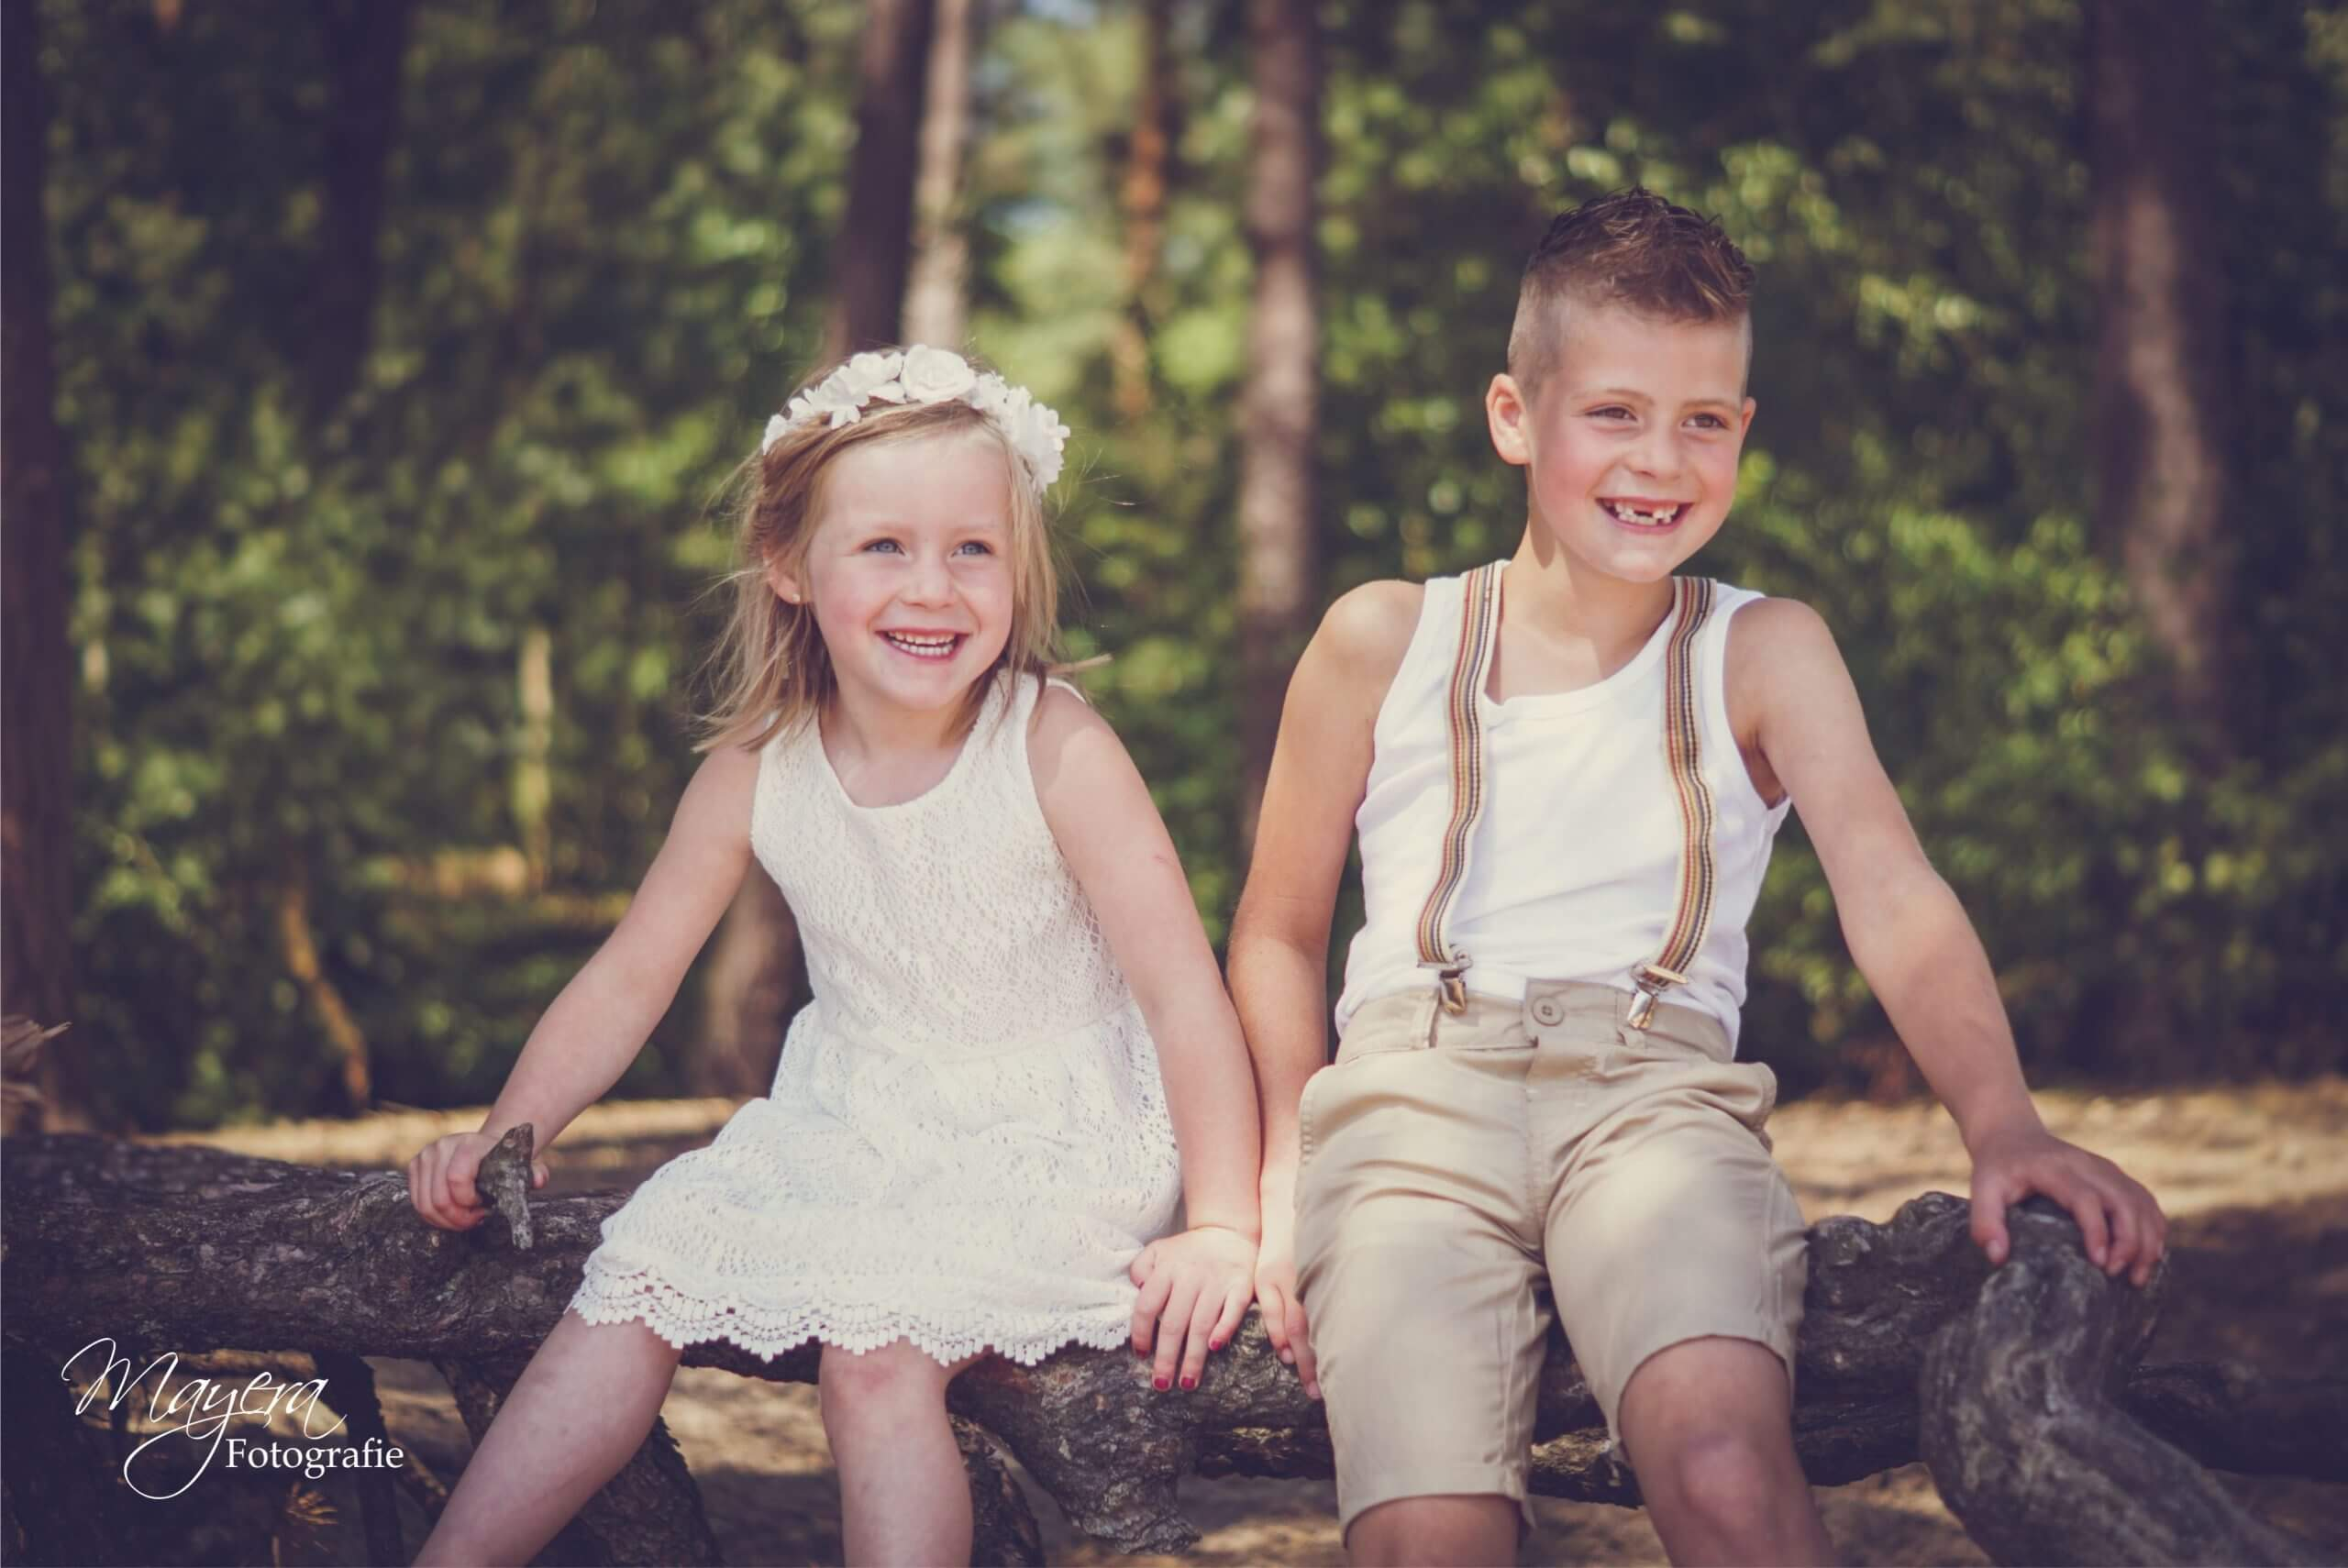 gezin sessie bos